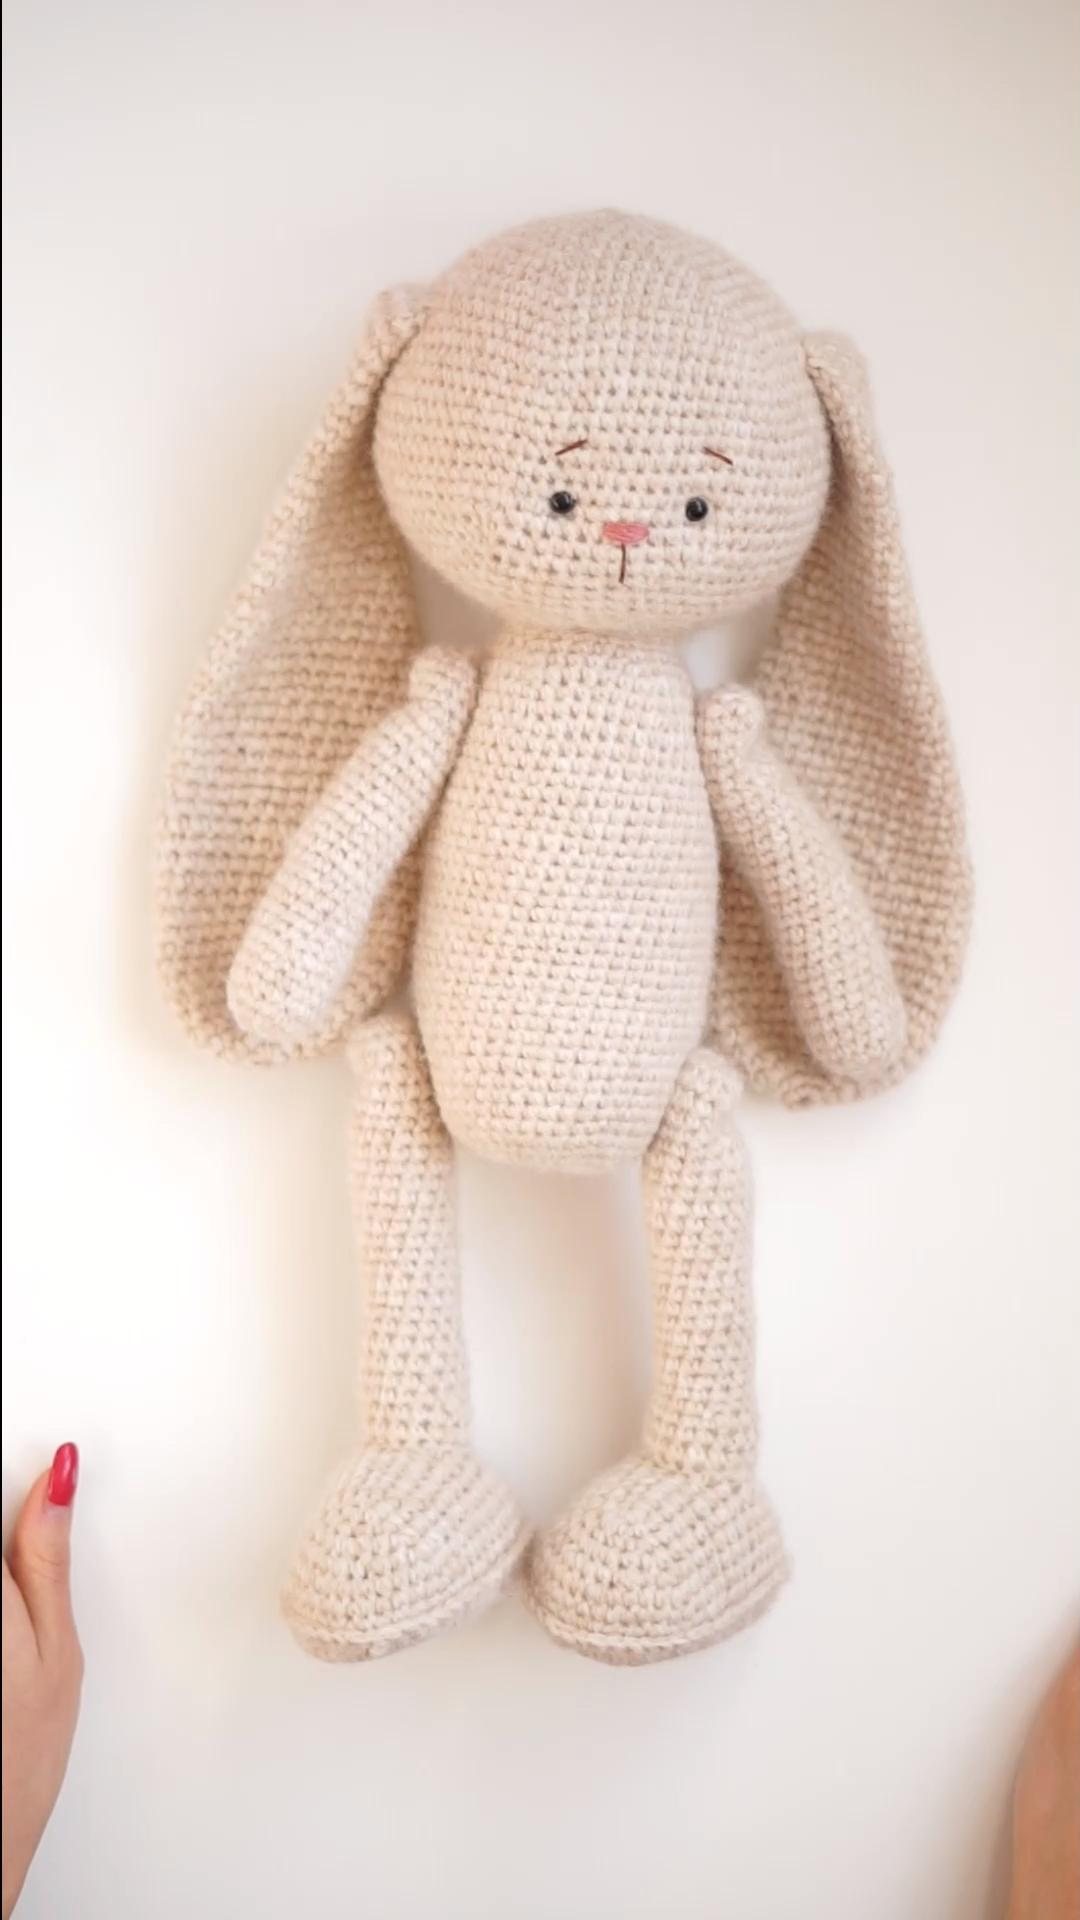 BestSeller - Crochet Bunny Pattern by PolushkaBunny